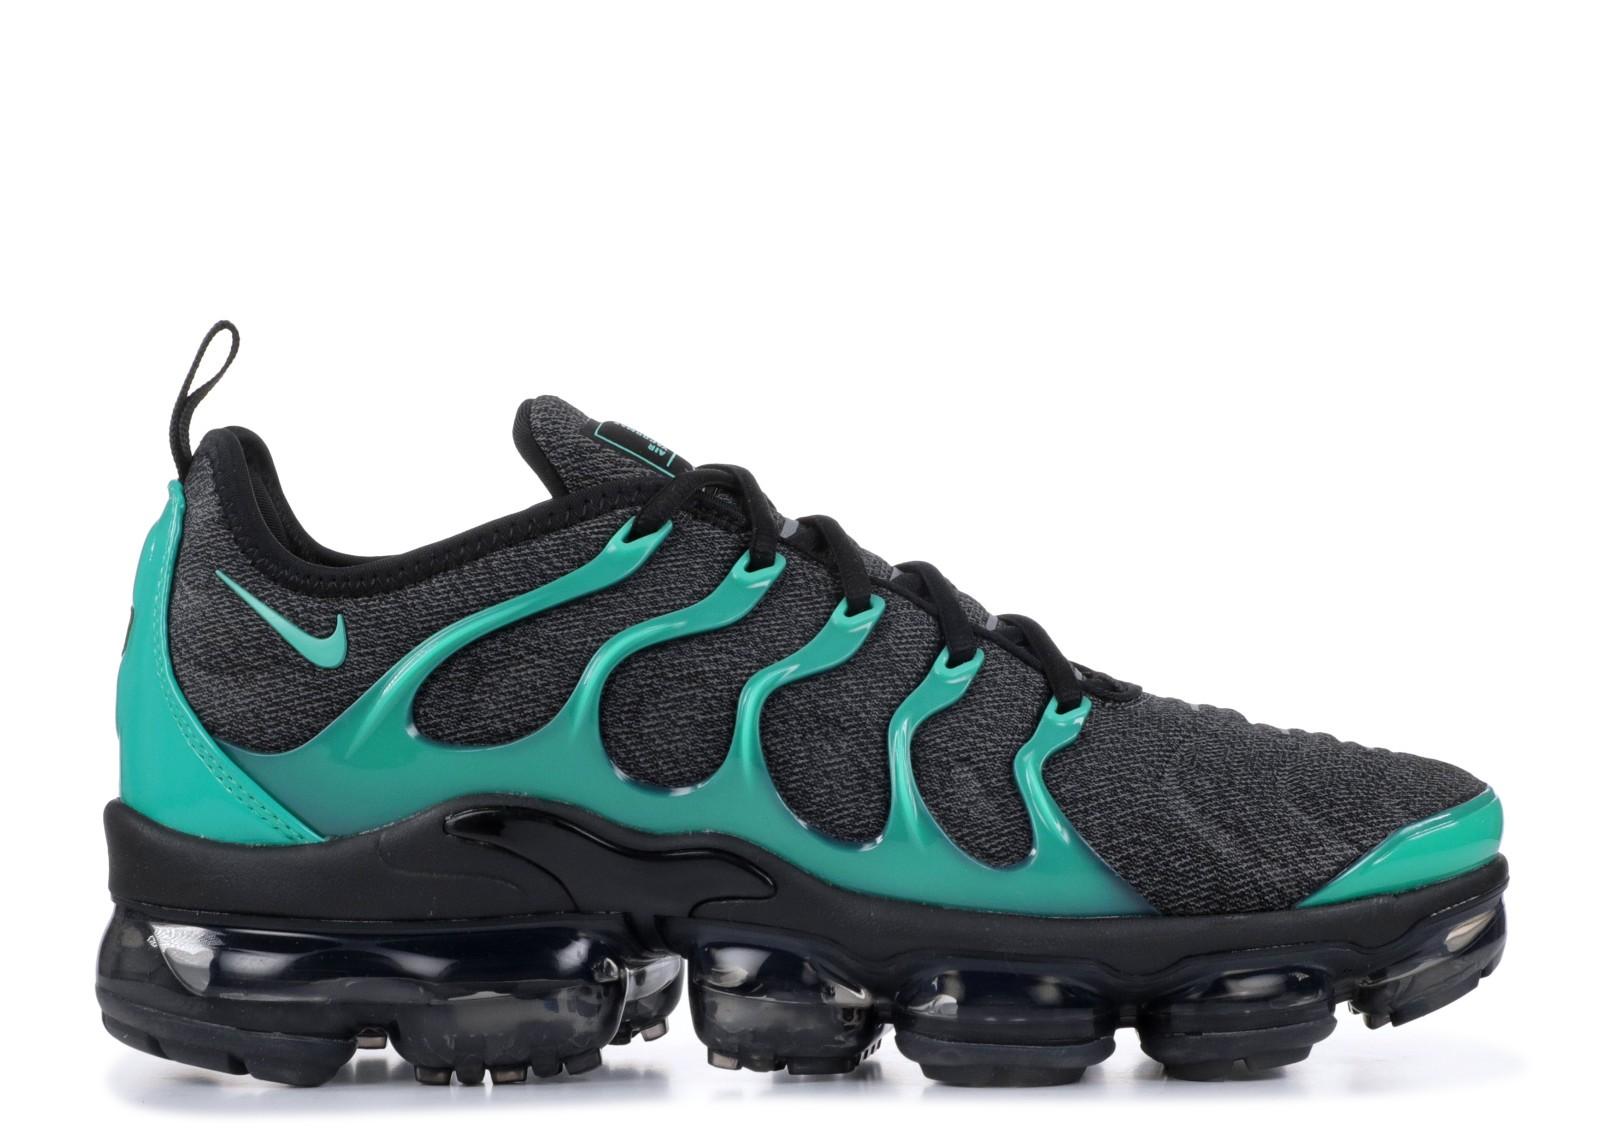 size 40 dcf8e 90a3f Prev Nike Air VaporMax Plus Eagles Black Green 924453-013